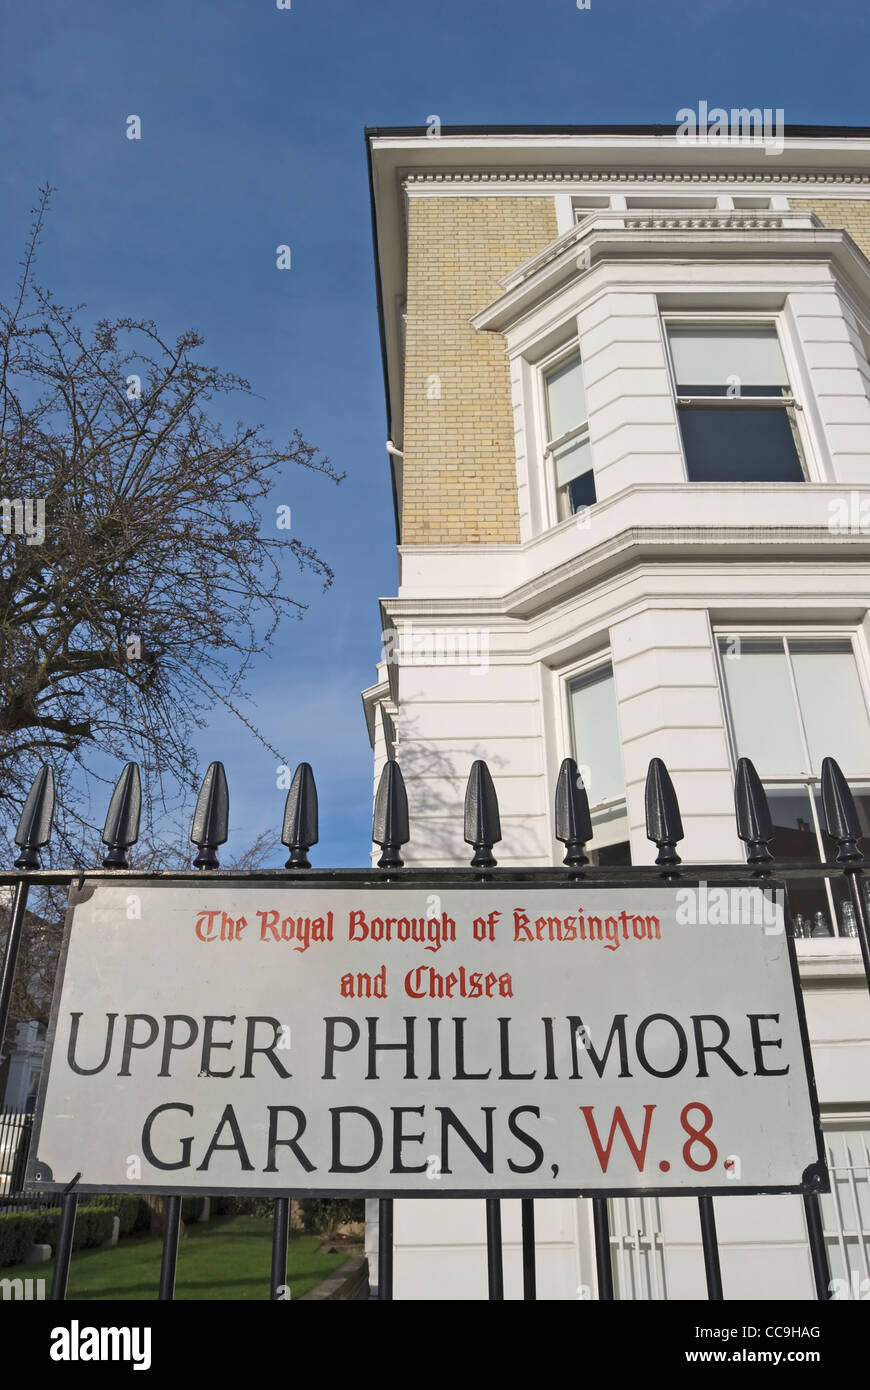 Upper Phillimore Gardens Stock Photos & Upper Phillimore